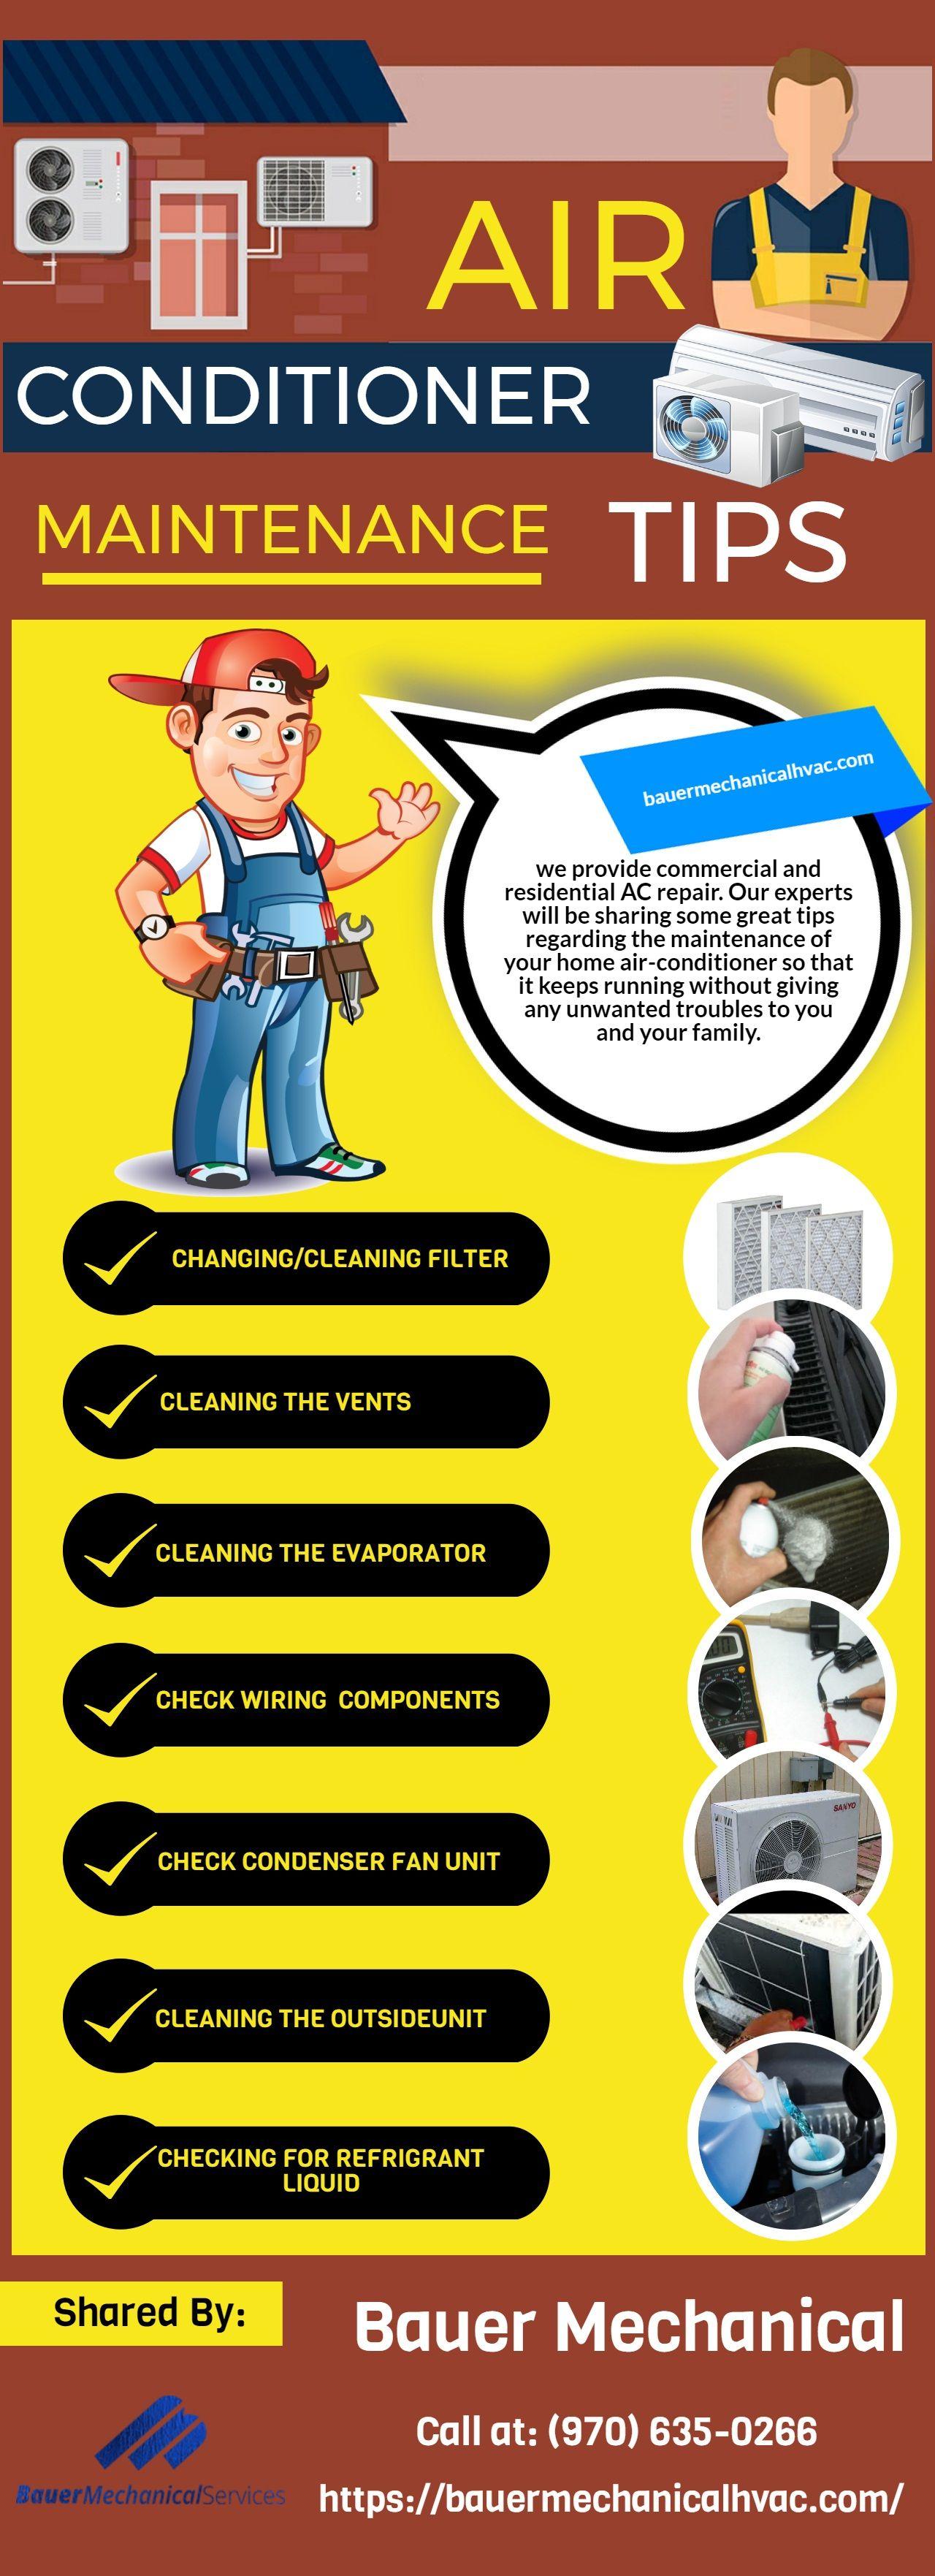 Air Conditioner Maintenance Tips Air conditioner